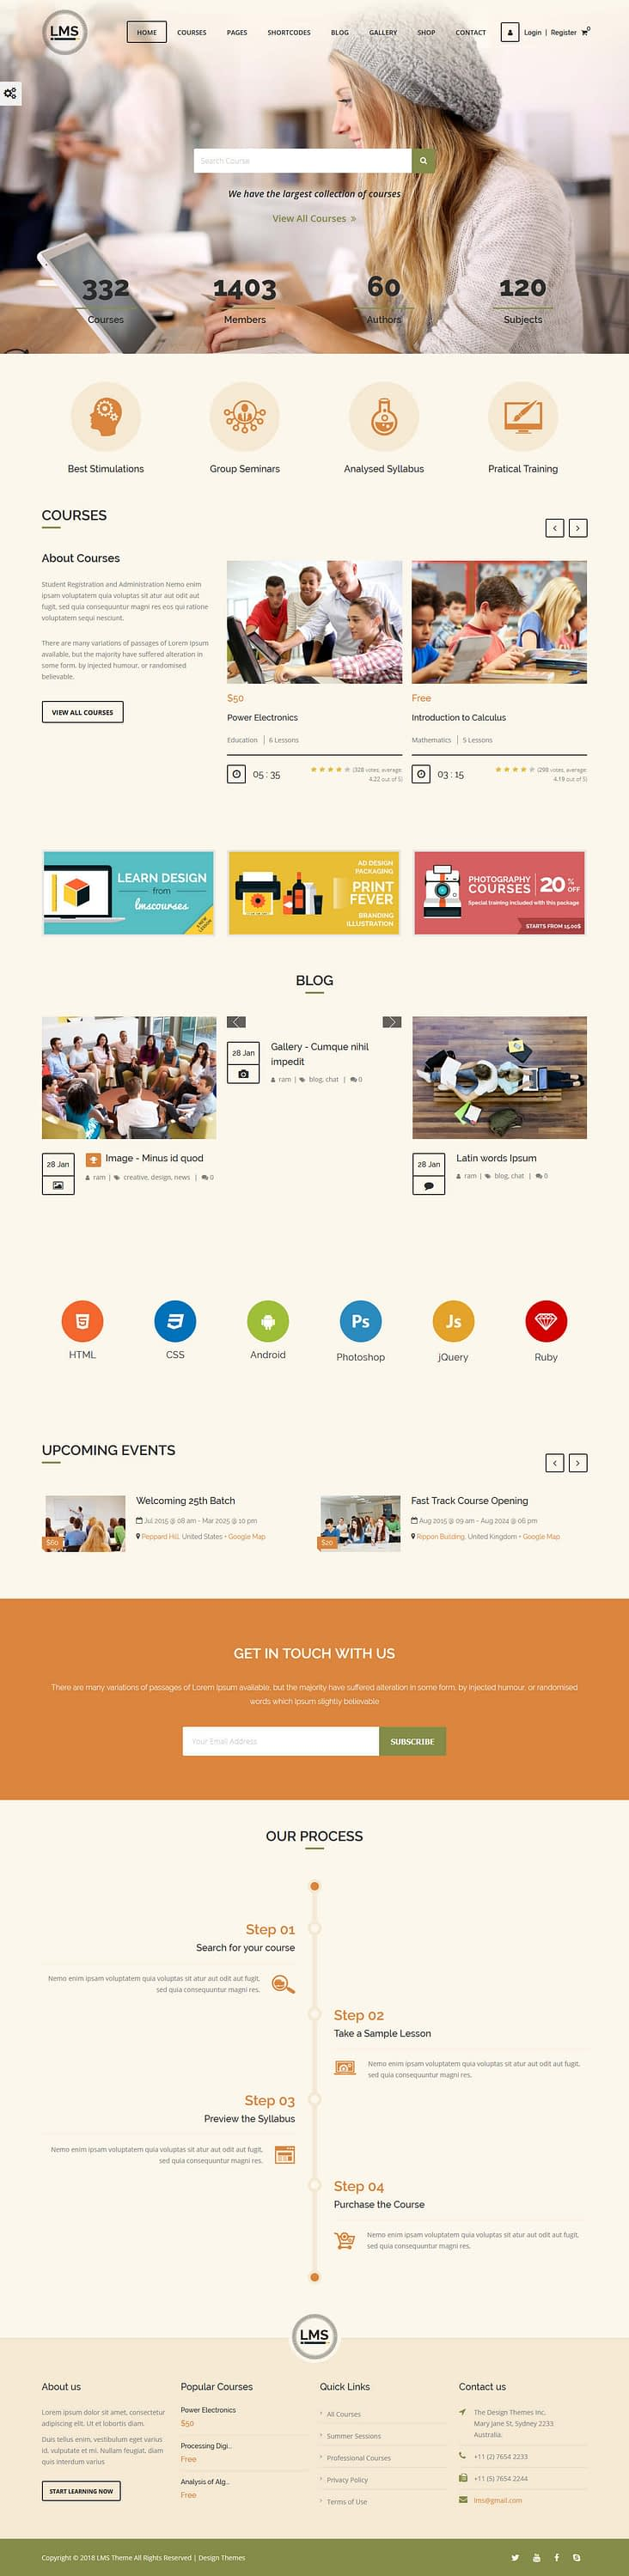 lms best premium lms wordpress theme - 10+ Best Premium LMS WordPress Themes